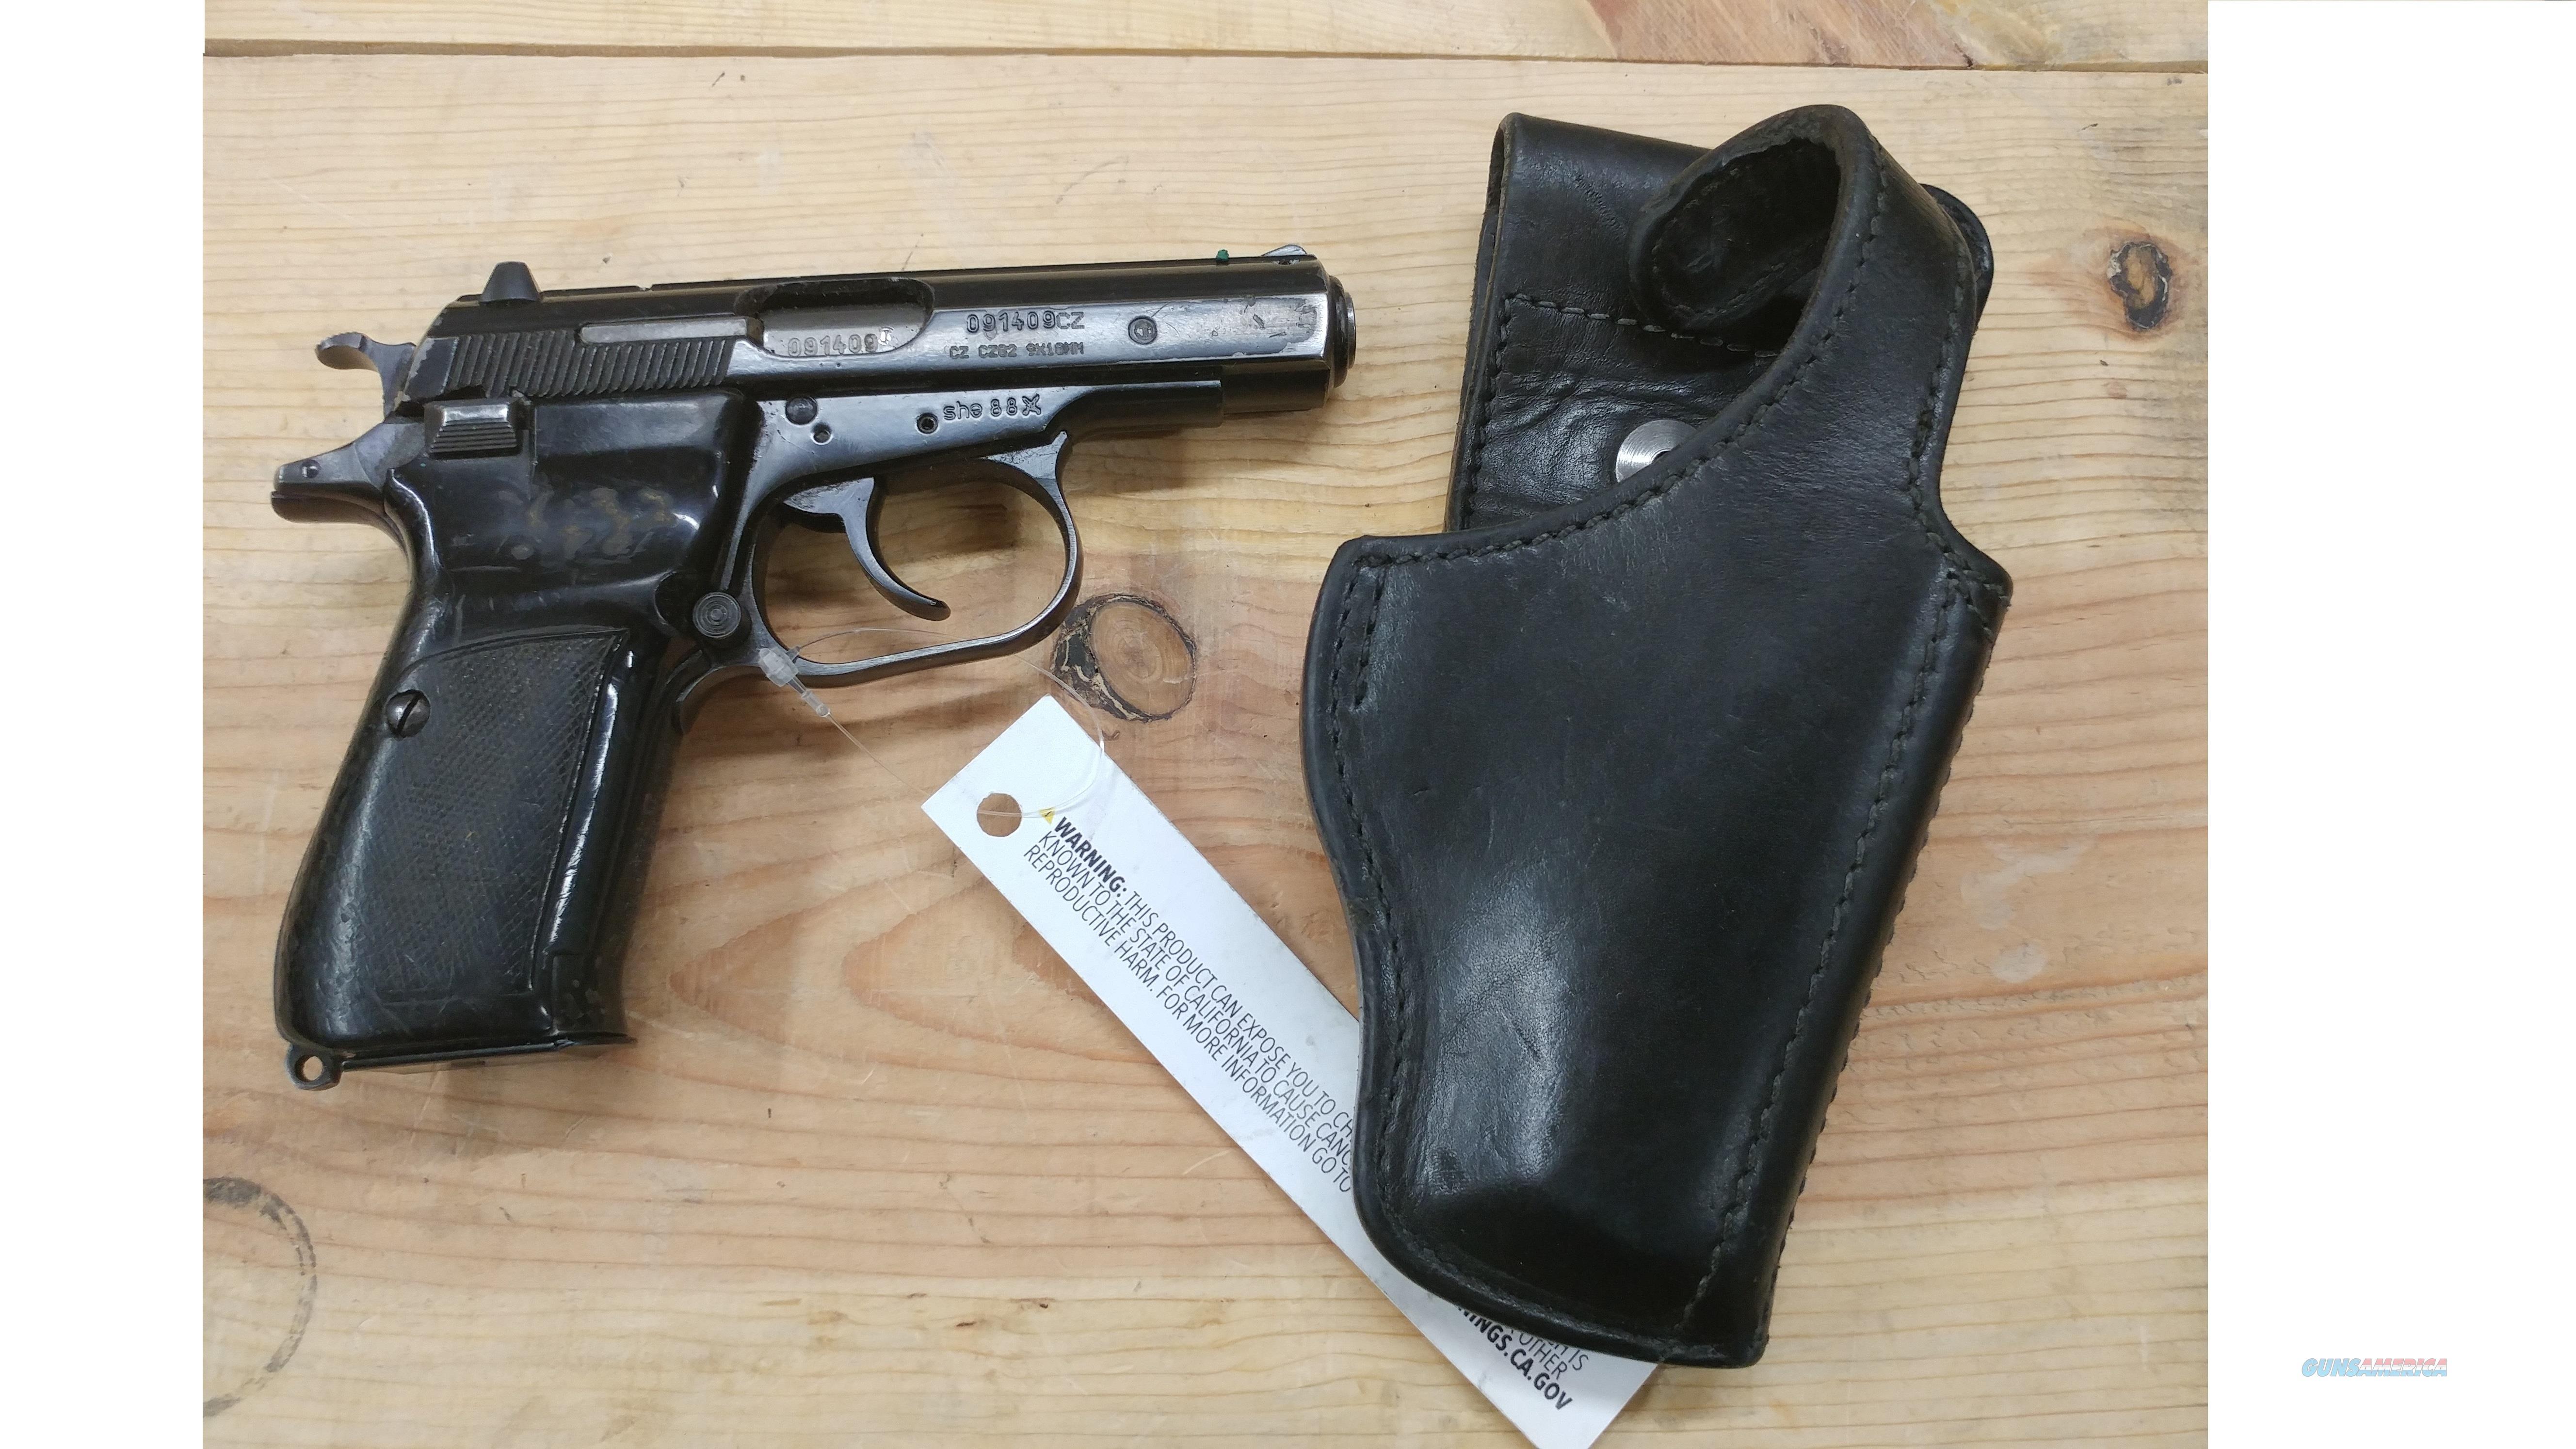 Newly Imported Czech Cz82 pistol 9mm Mak Makarov not 83 + Holster  Guns > Pistols > CZ Pistols